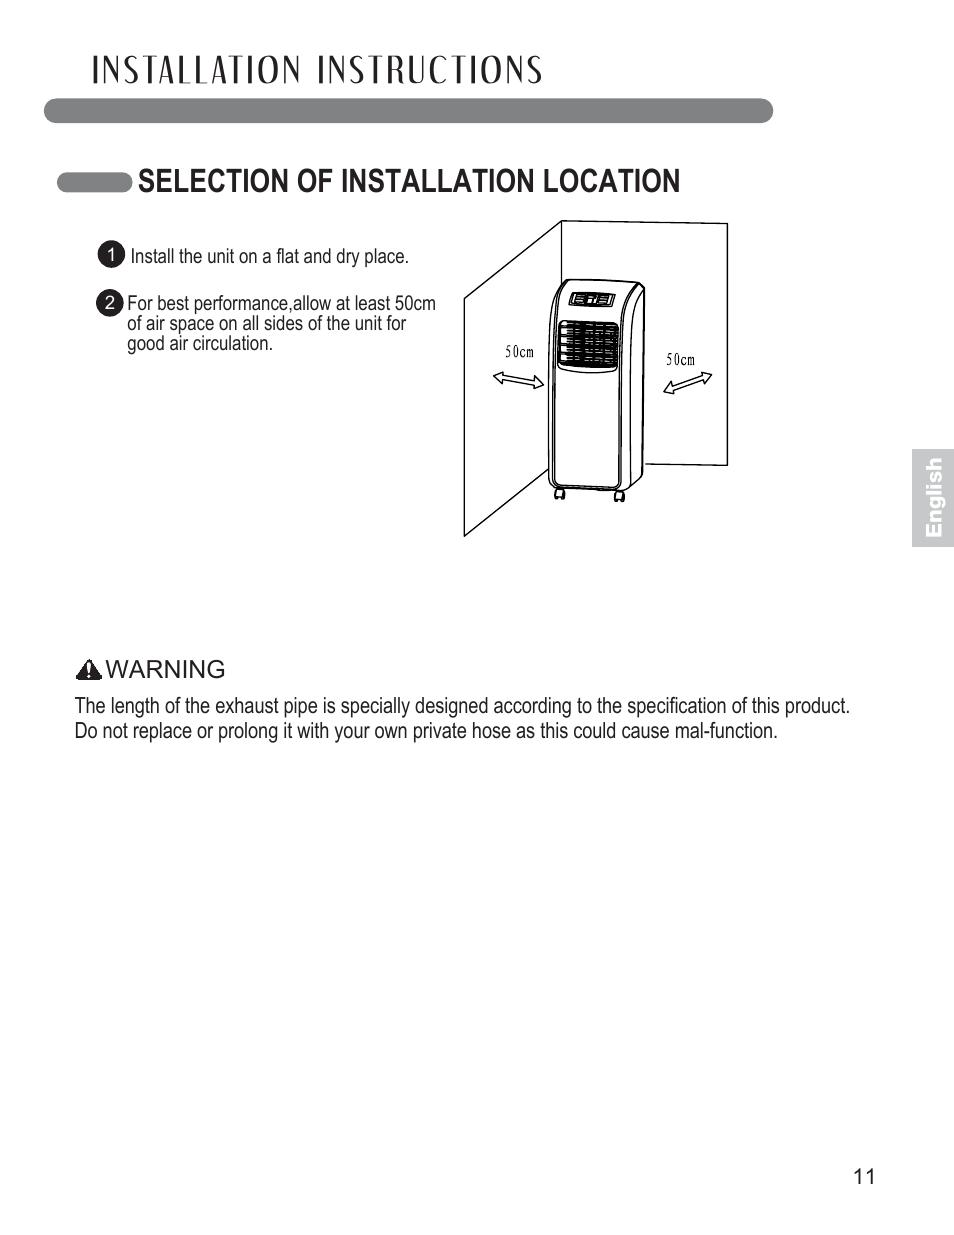 selection of installation location lg lp0711wnr user manual page rh manualsdir com lg model lp0711wnr owners manual LG Air Conditioner Remote Manual